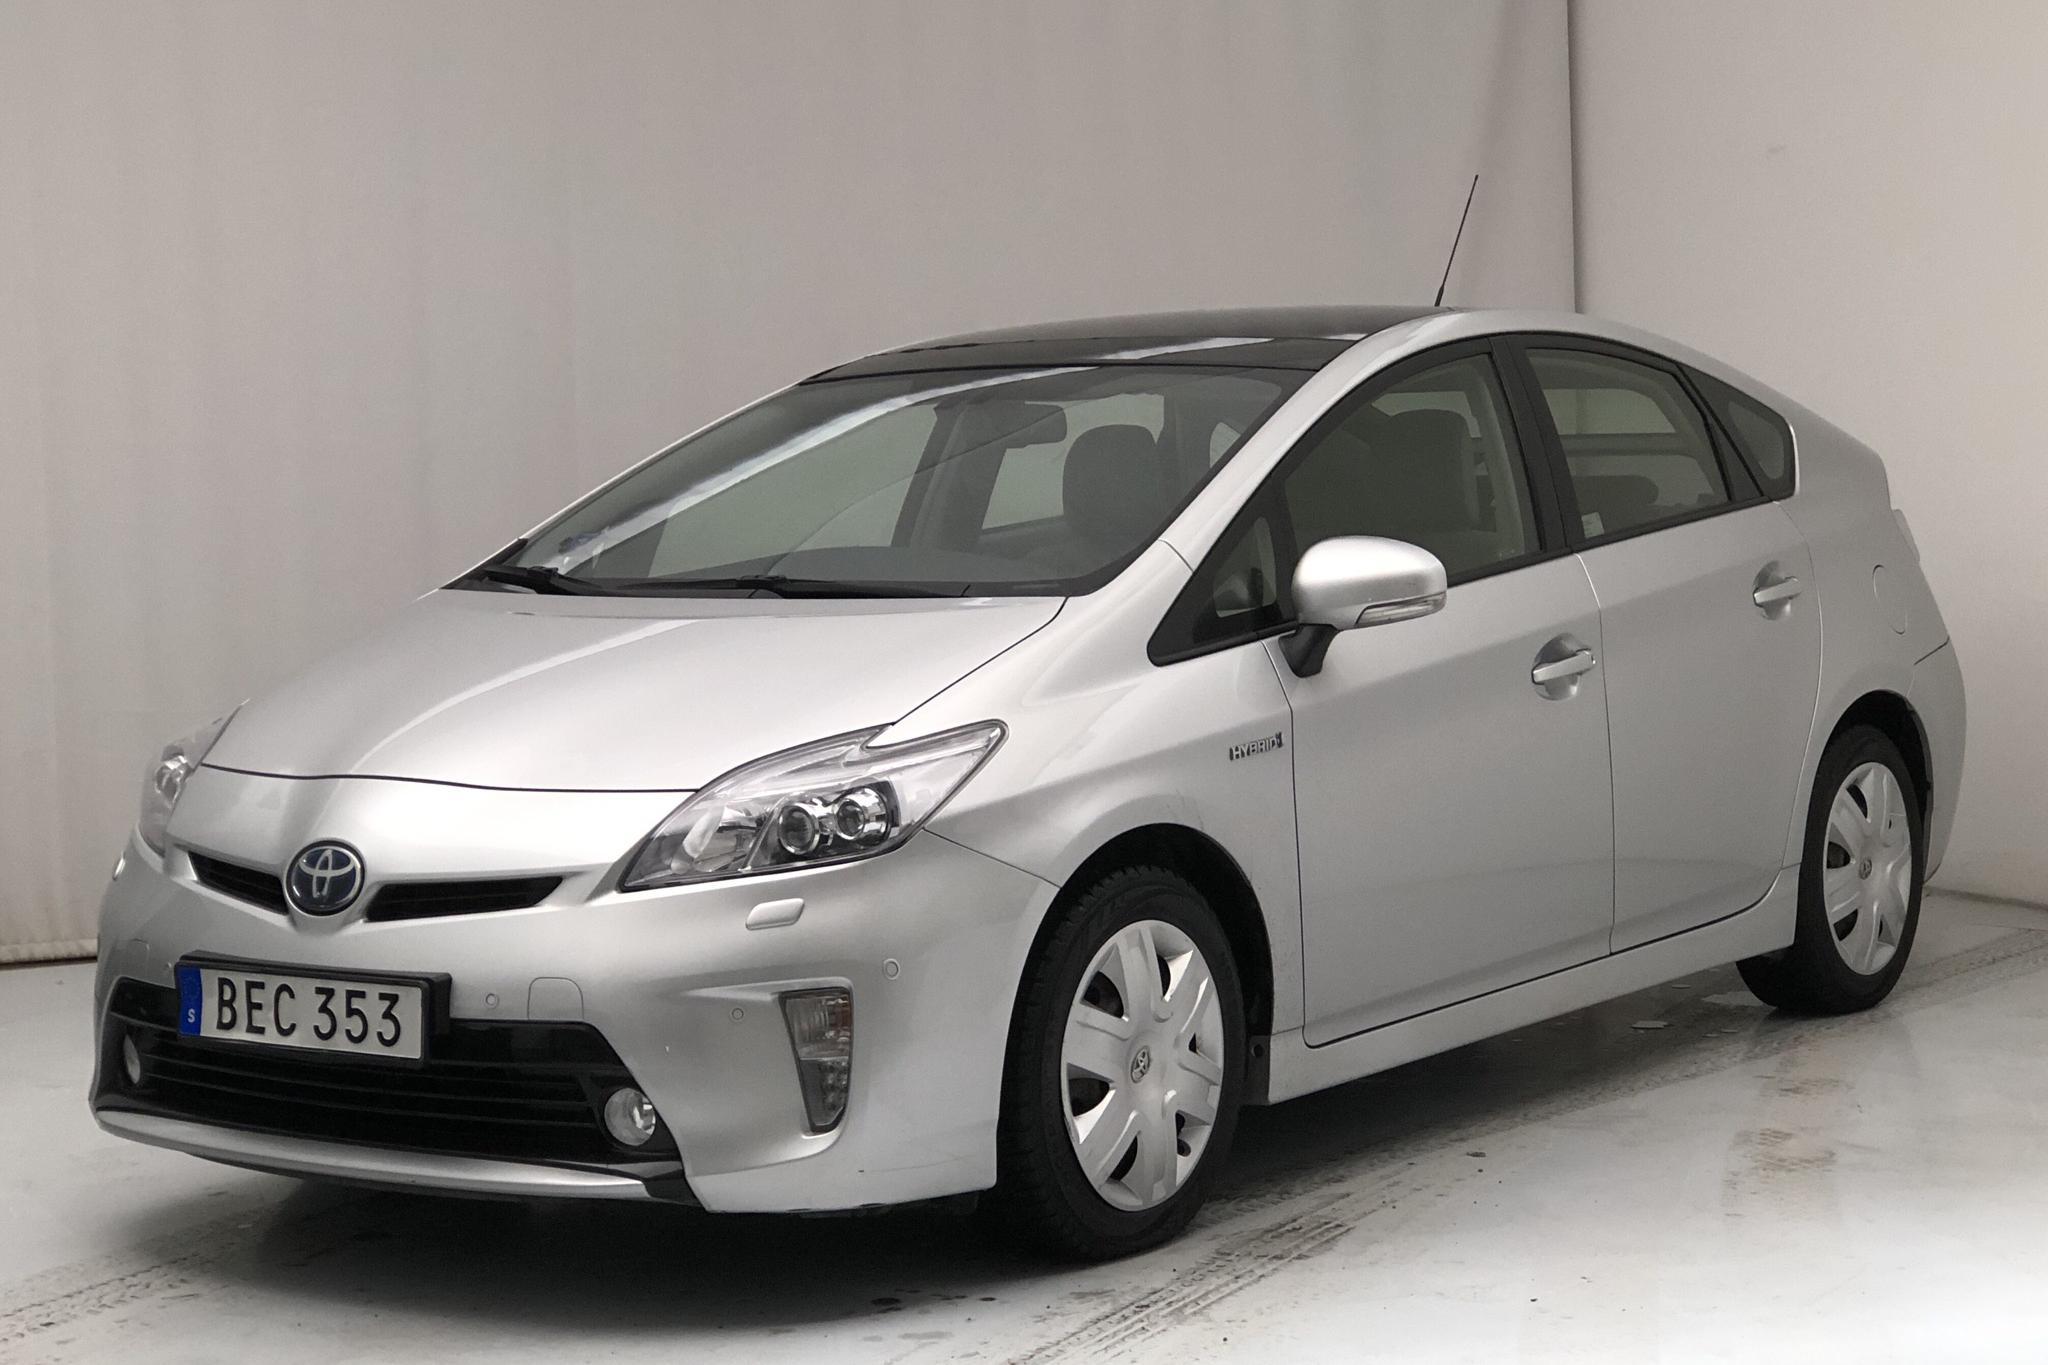 Toyota Prius 1.8 Hybrid (99hk) - 82 690 km - Automatic - silver - 2014